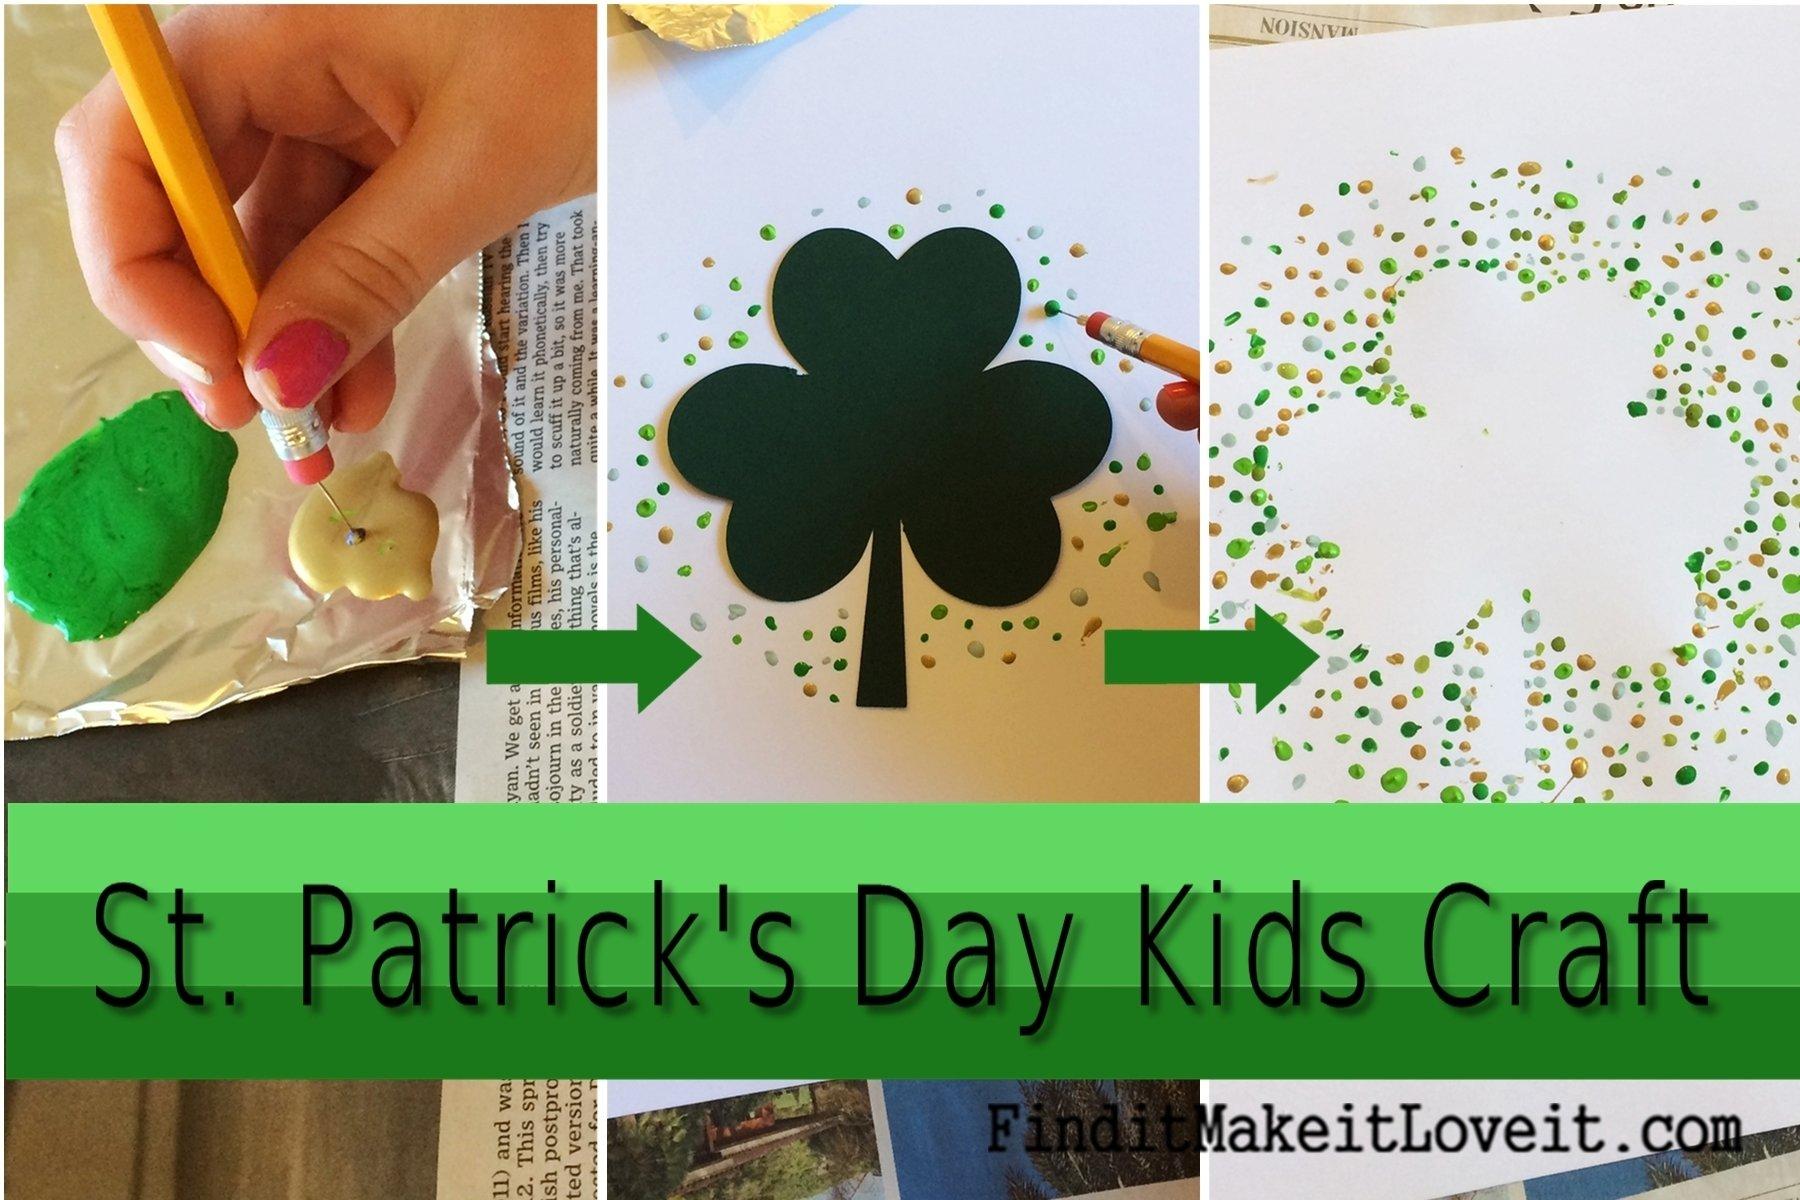 10 Cute St Patrick Day Craft Ideas st patricks day kids craft find it make it love it 2021